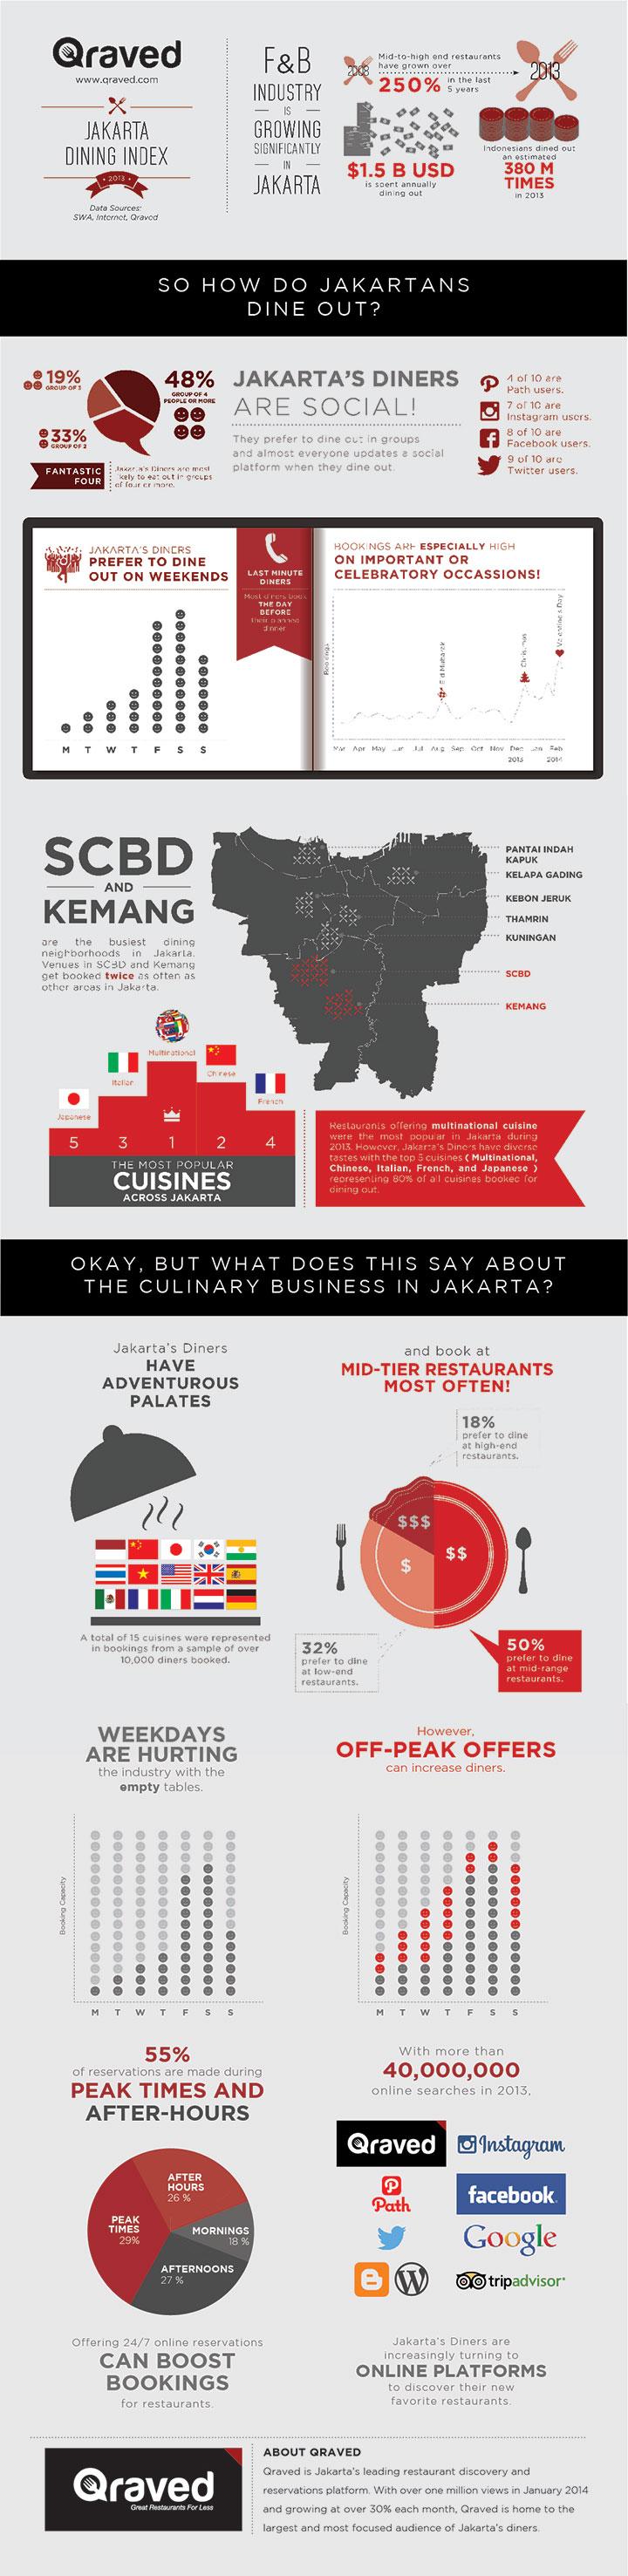 Qraved-Jakarta-Dining-Index-2013